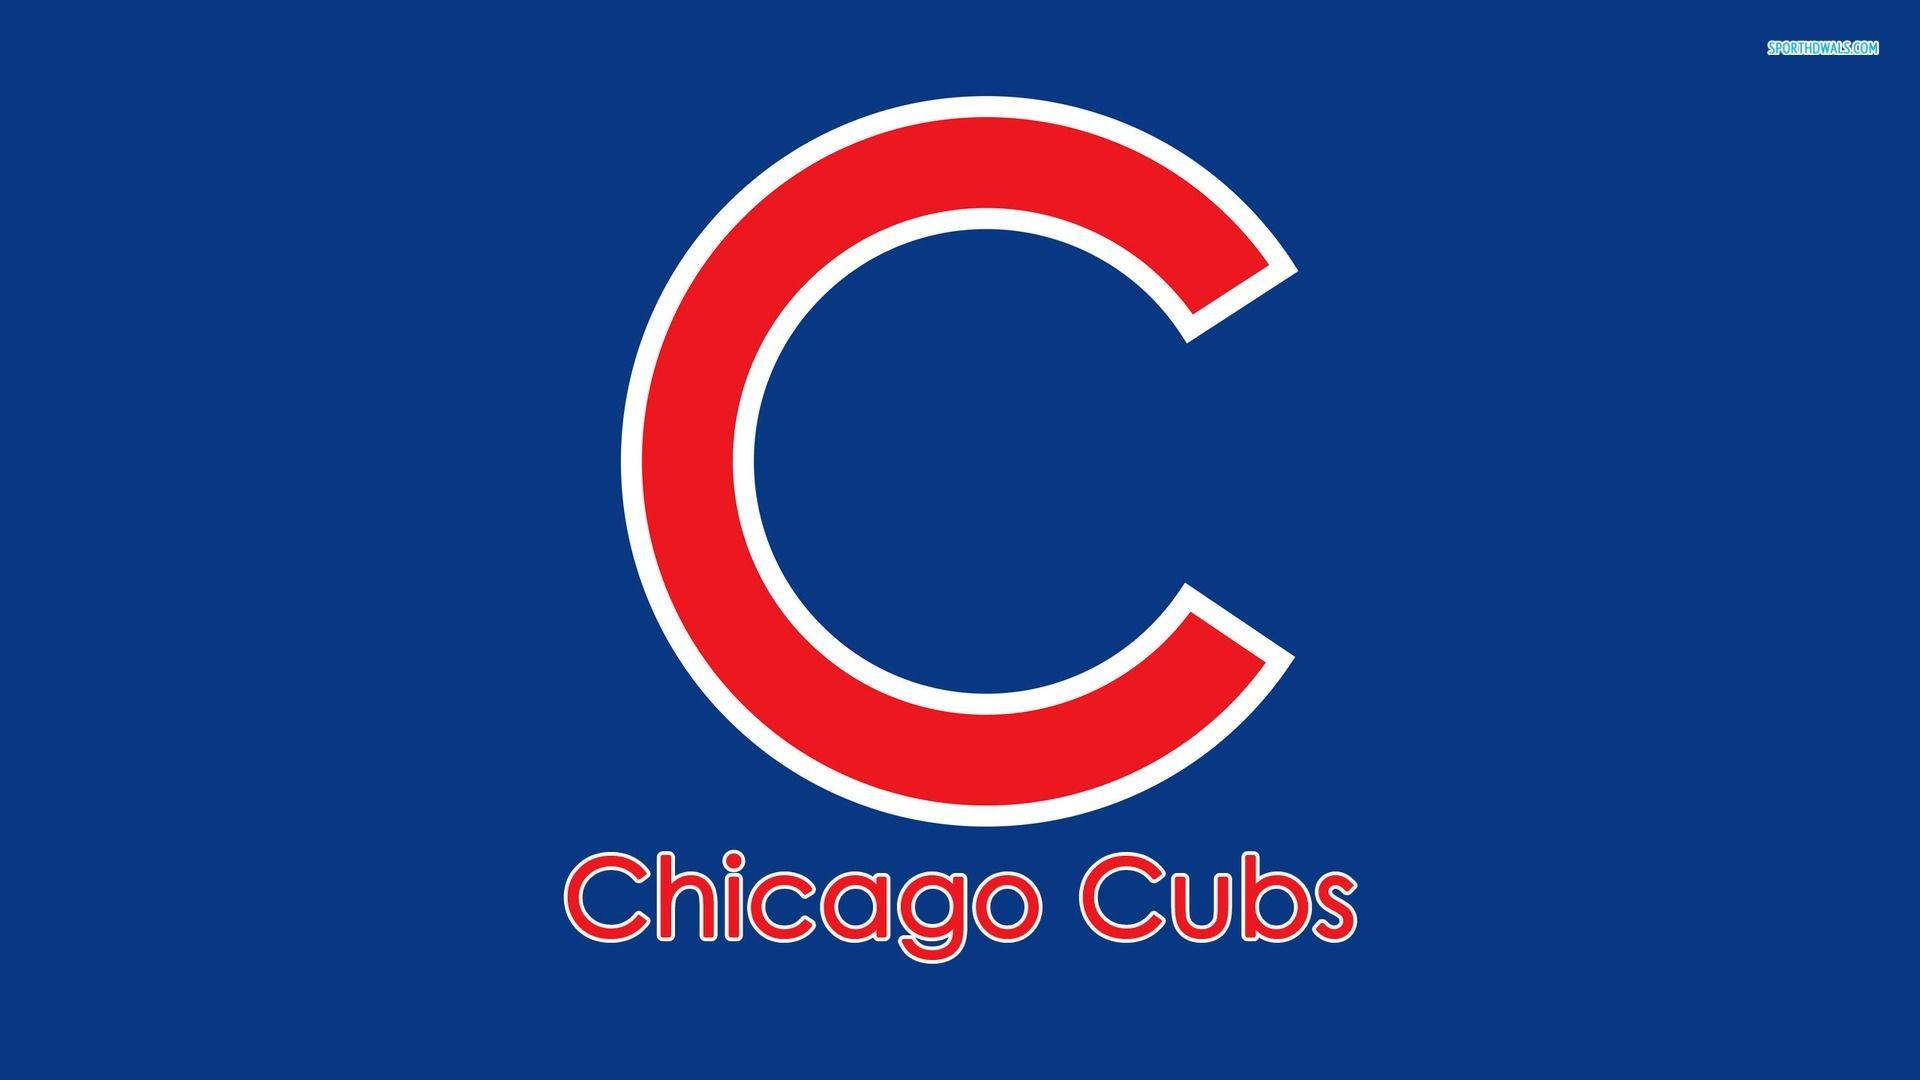 Chicago Cubs wallpaper | | #69228